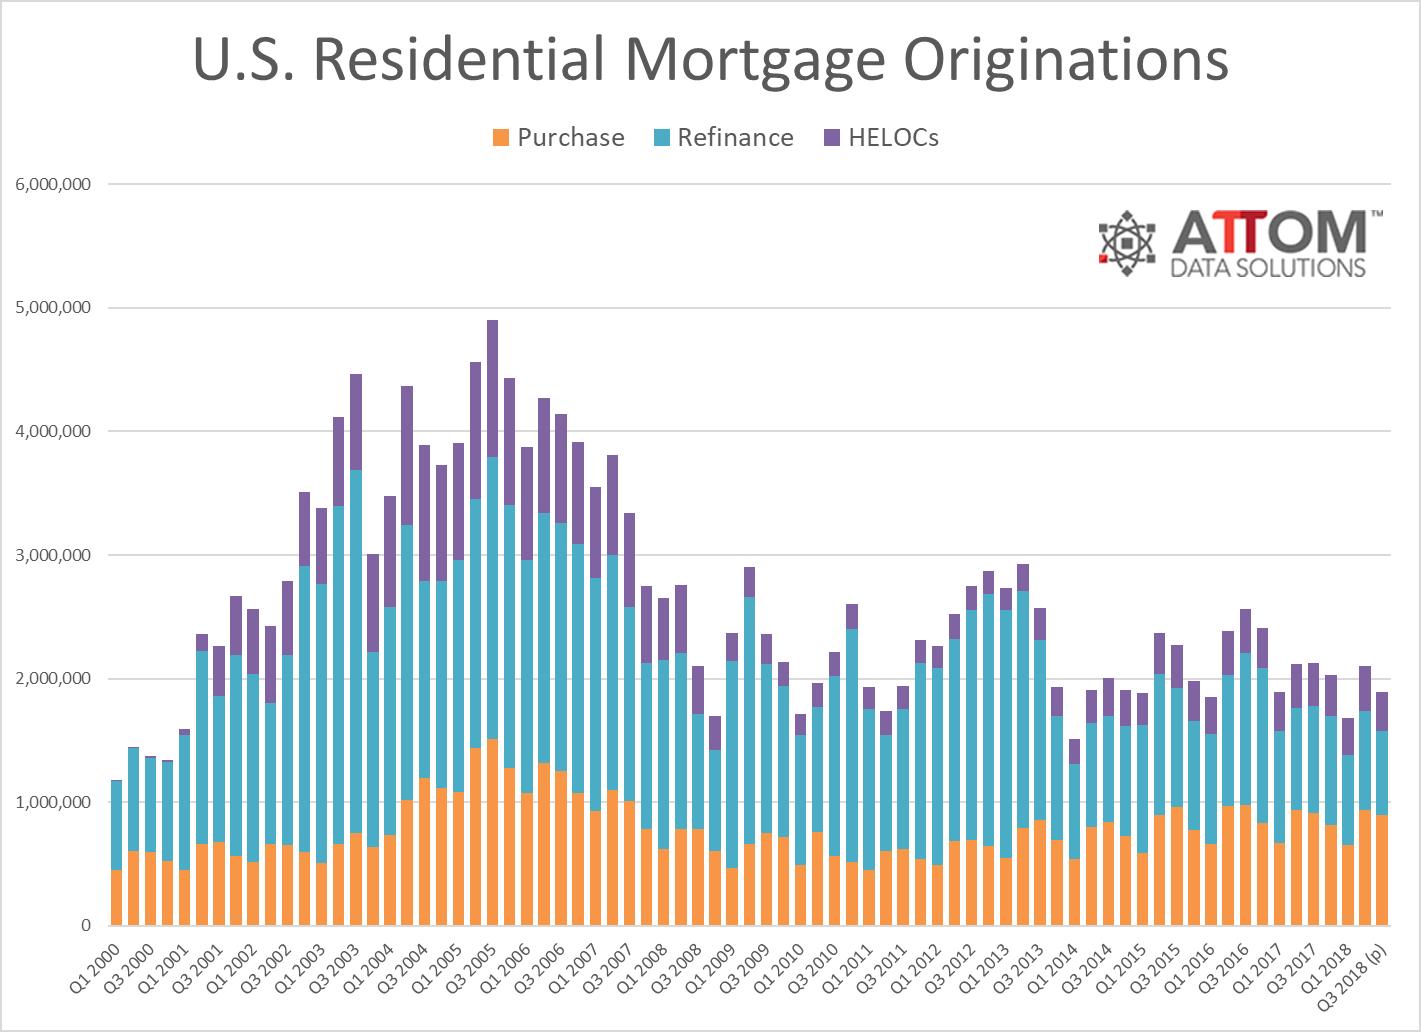 Mortgage_Origination_Historical_Q3_2018.png